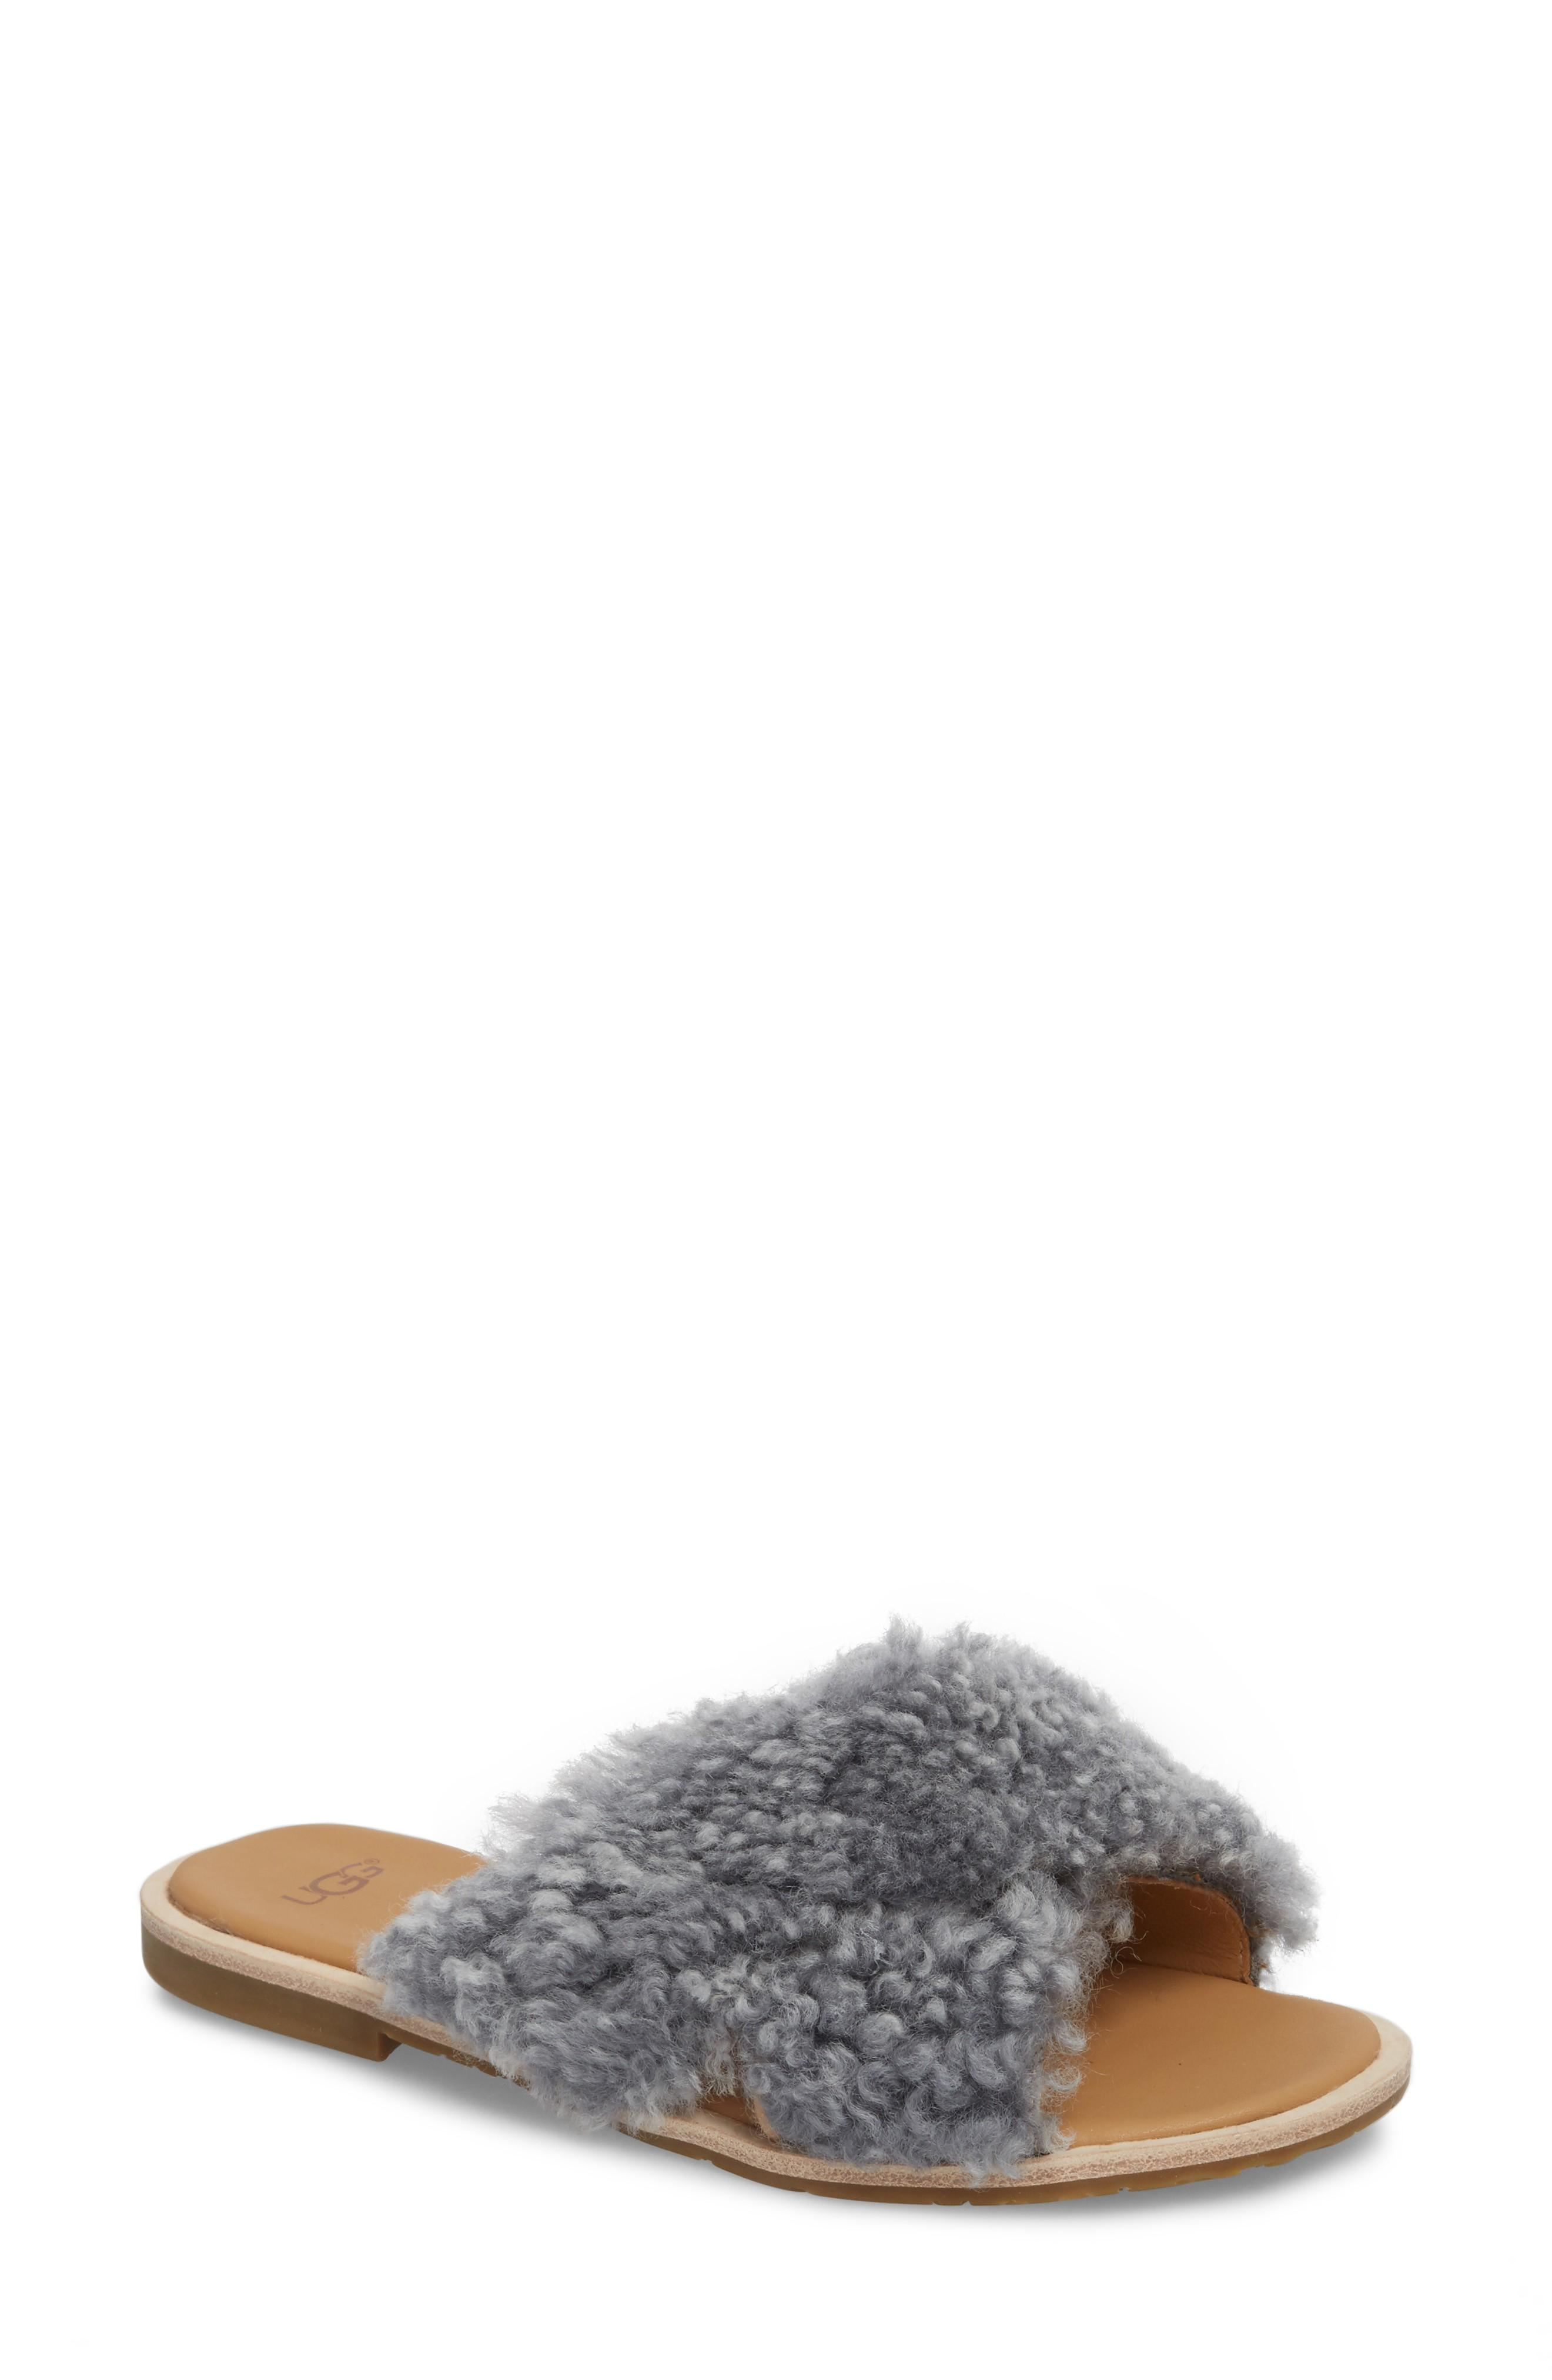 7ee2108c4 Ugg Joni Genuine Shearling Slide Sandal In Lude Grey | ModeSens